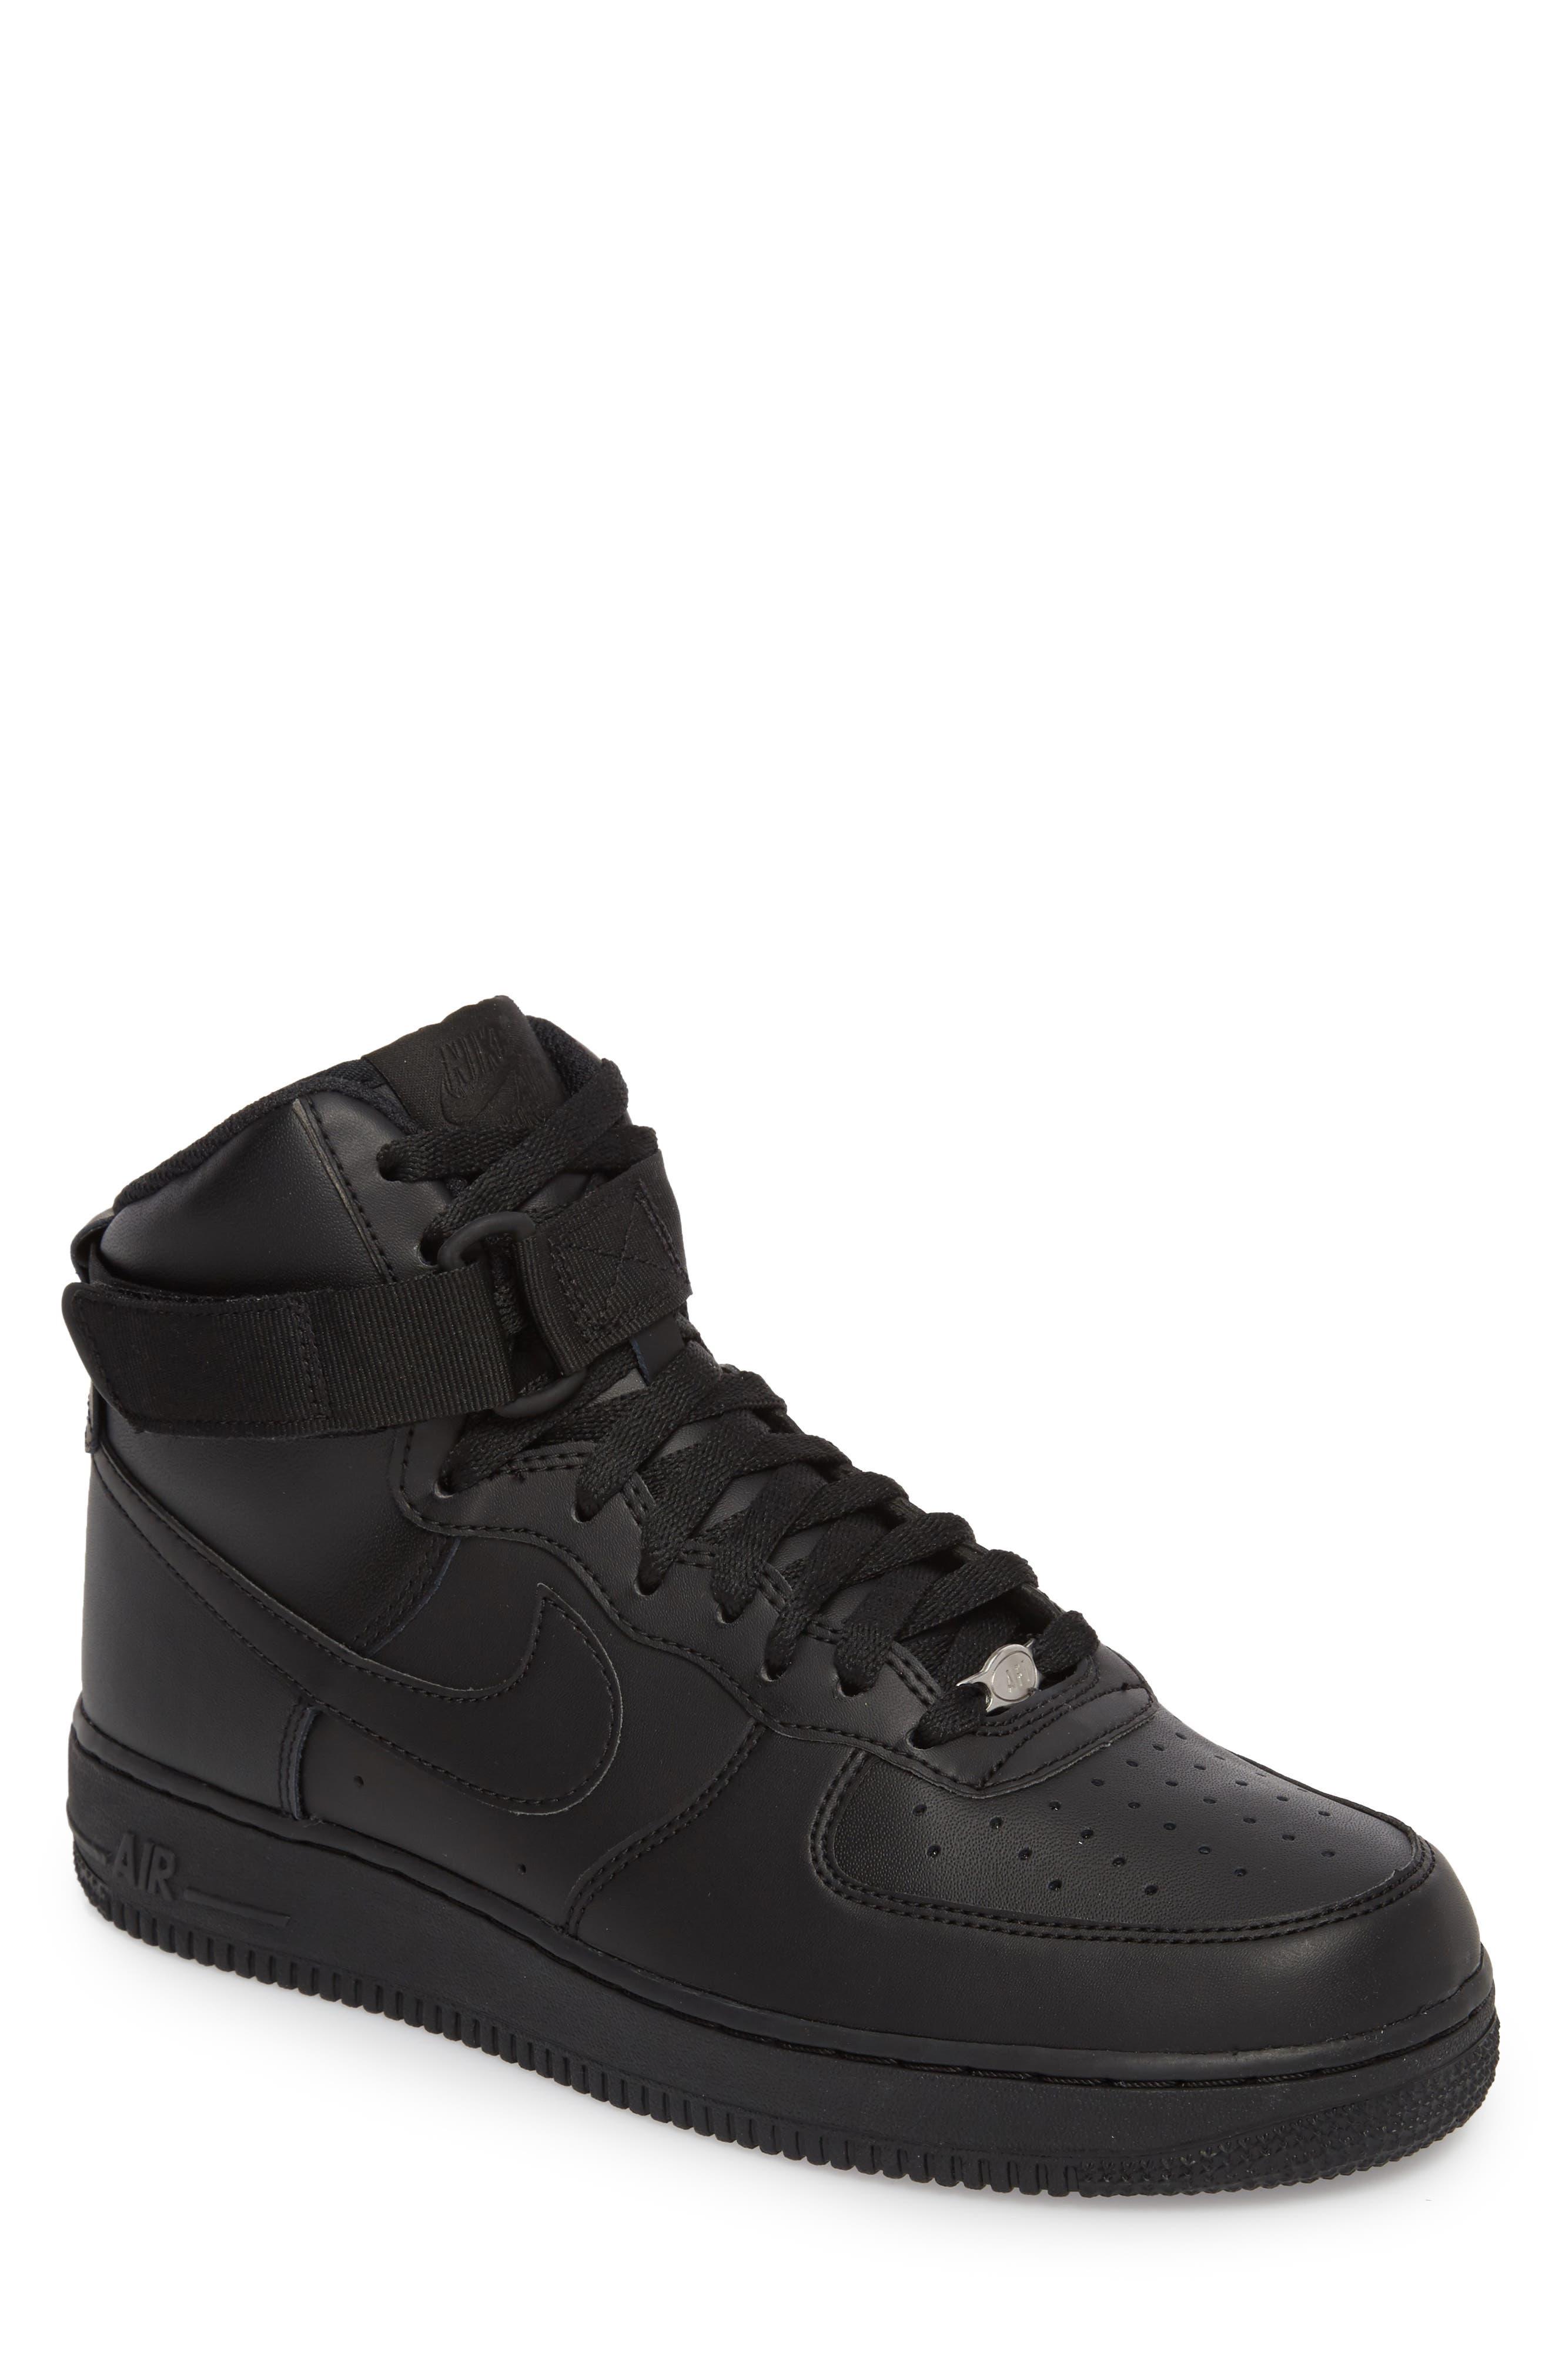 Air Force 1 High '07 Sneaker,                             Main thumbnail 1, color,                             Black/ Black